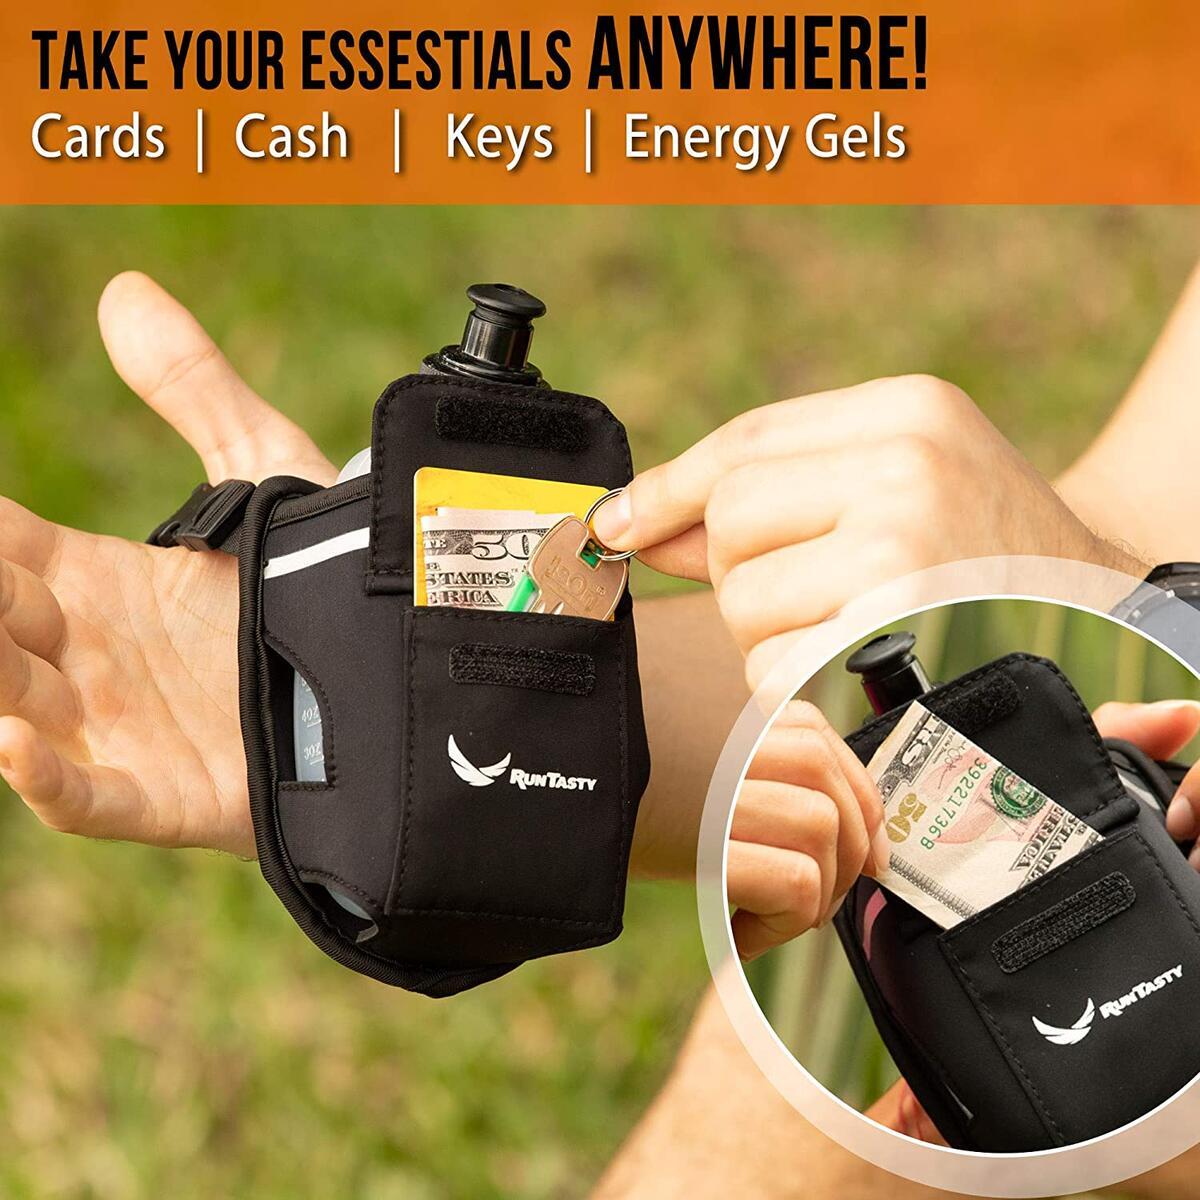 2-in-1 Running Fun: Handheld 12 oz Bottle & Running Belt Add-on by Runtasty